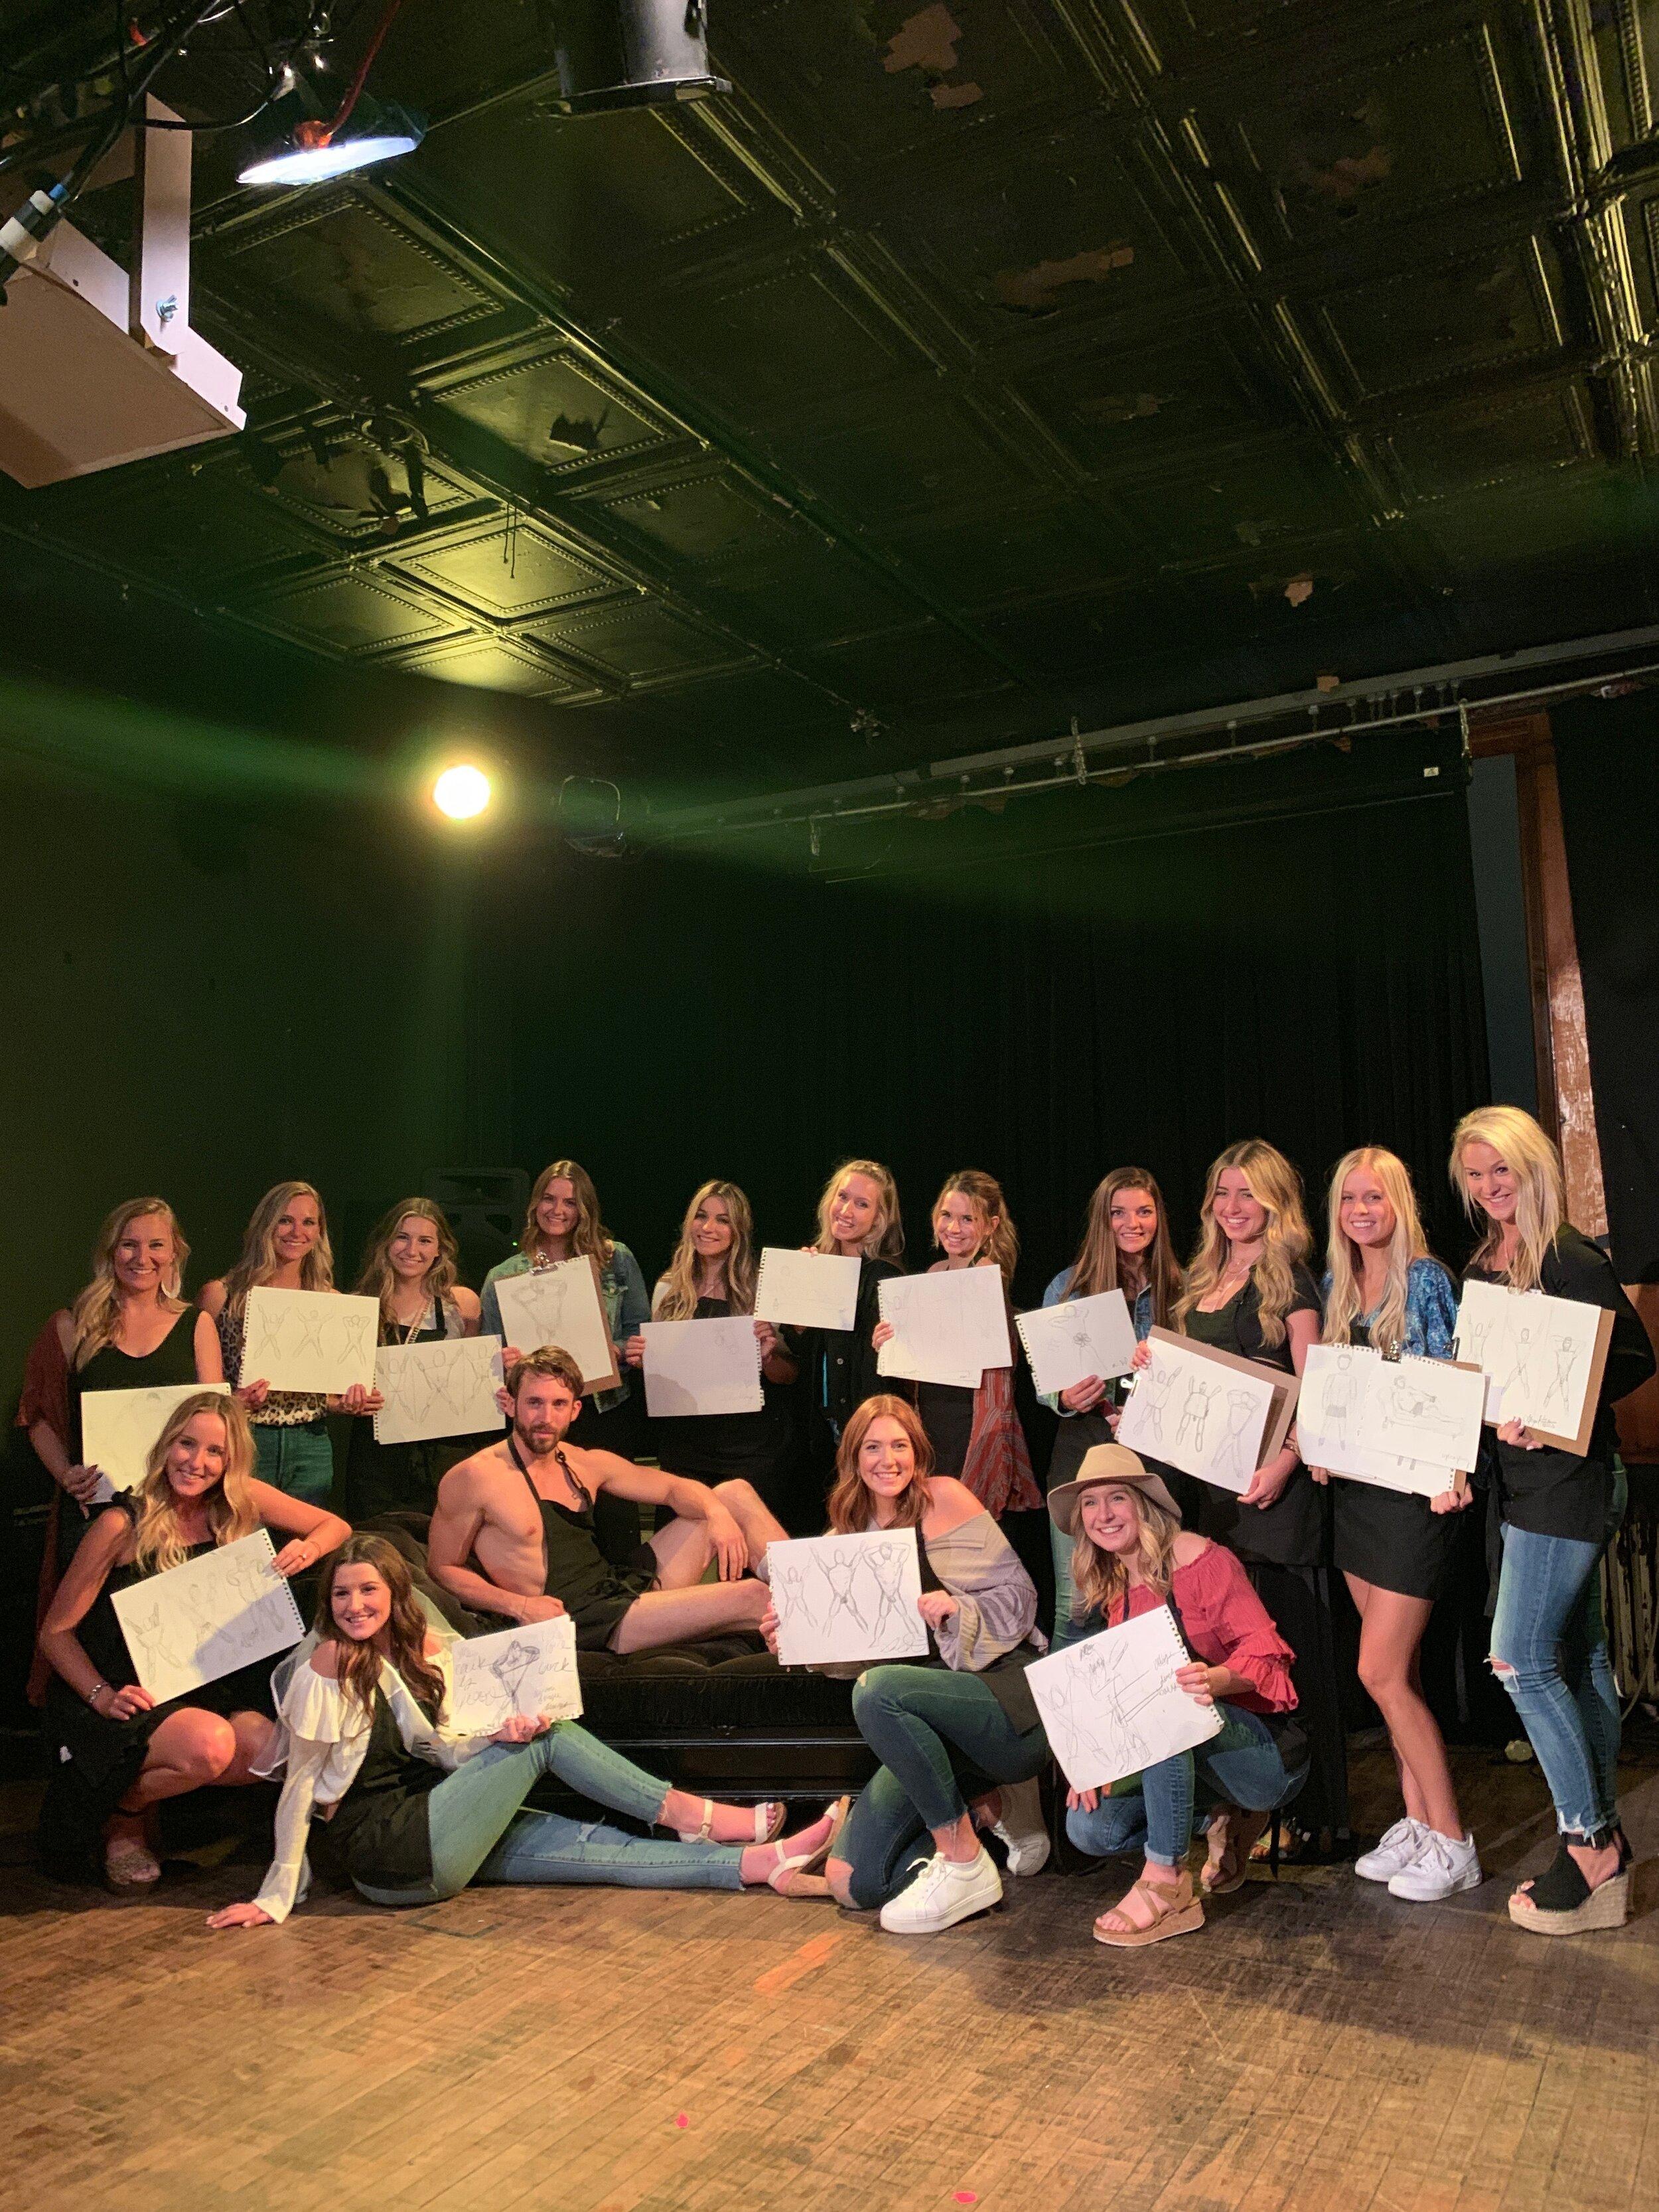 Bachelorette Party Chicago